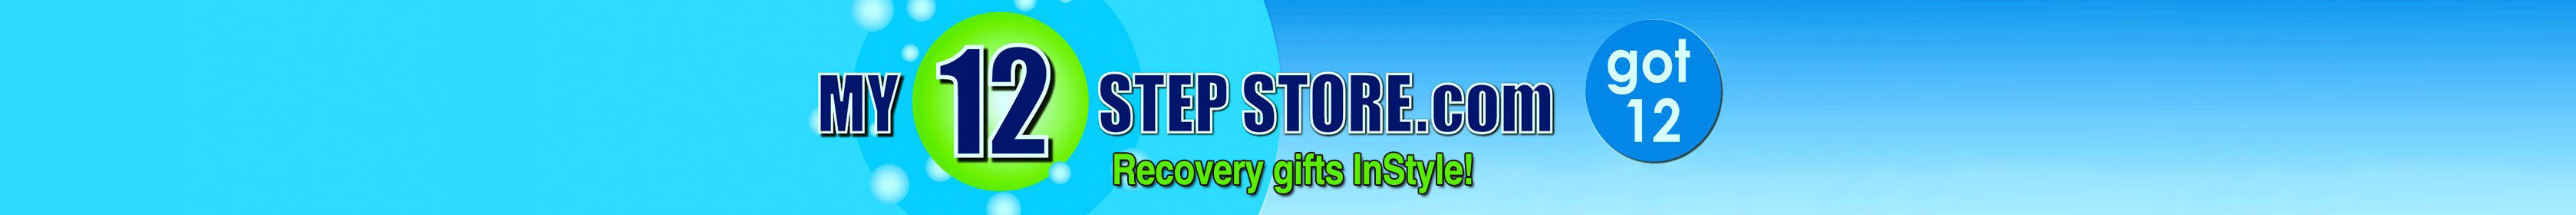 My 12 Step Store